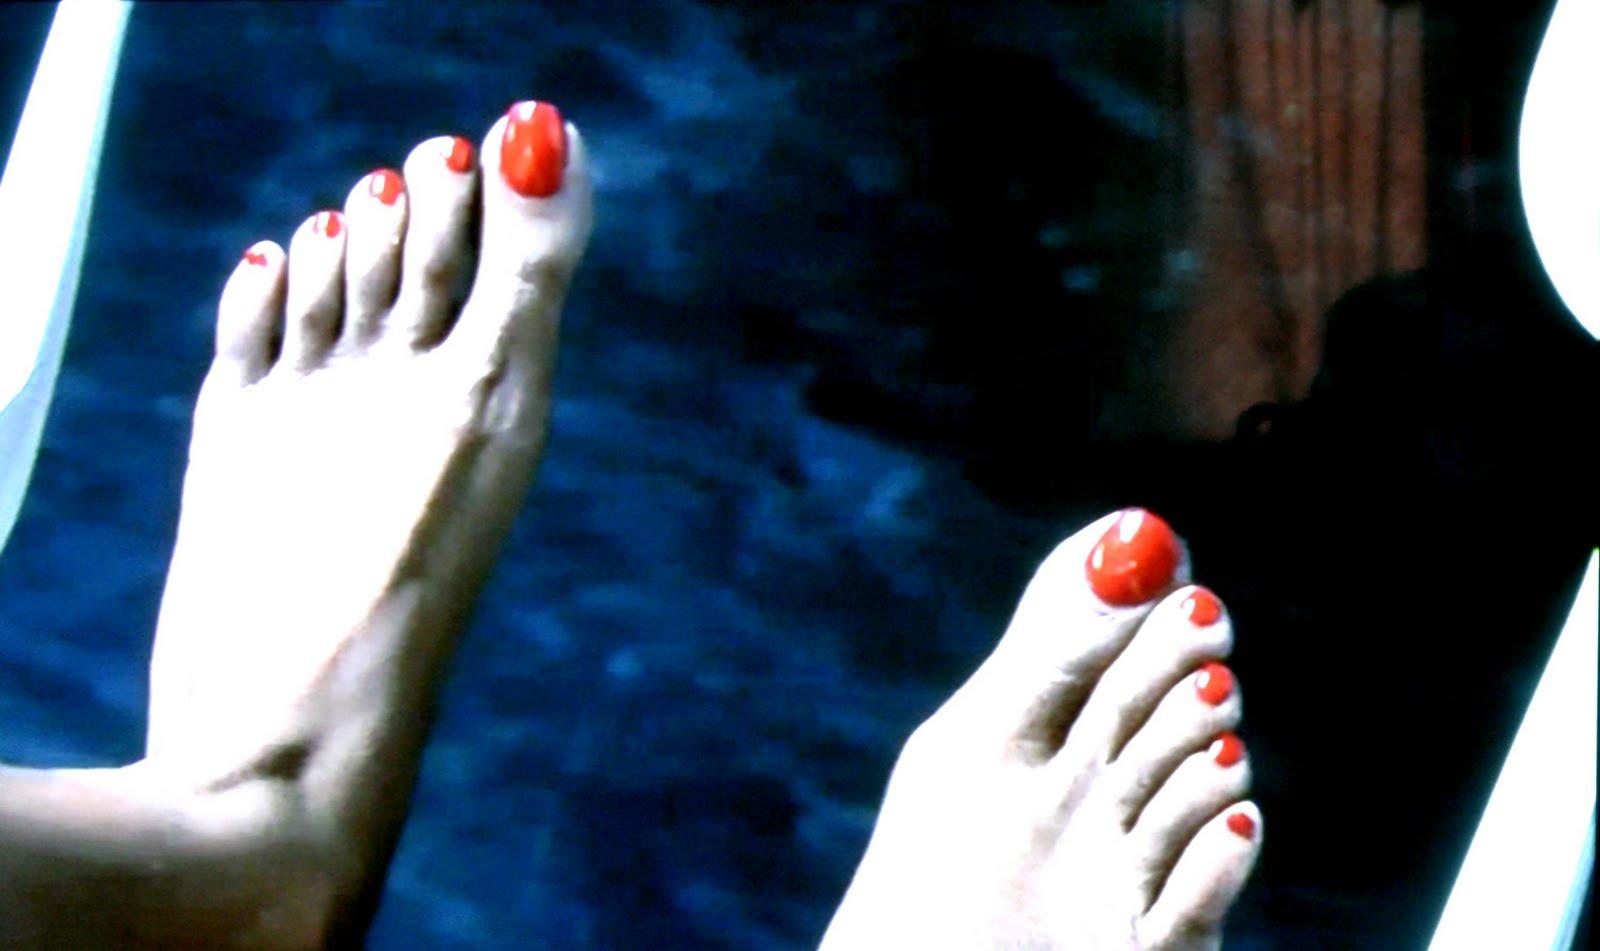 http://3.bp.blogspot.com/_UaLWp72nij4/TFHm0ksJVdI/AAAAAAAASjs/lhv2nFme-js/s1600/taraji-p-henson-feet-2.jpg